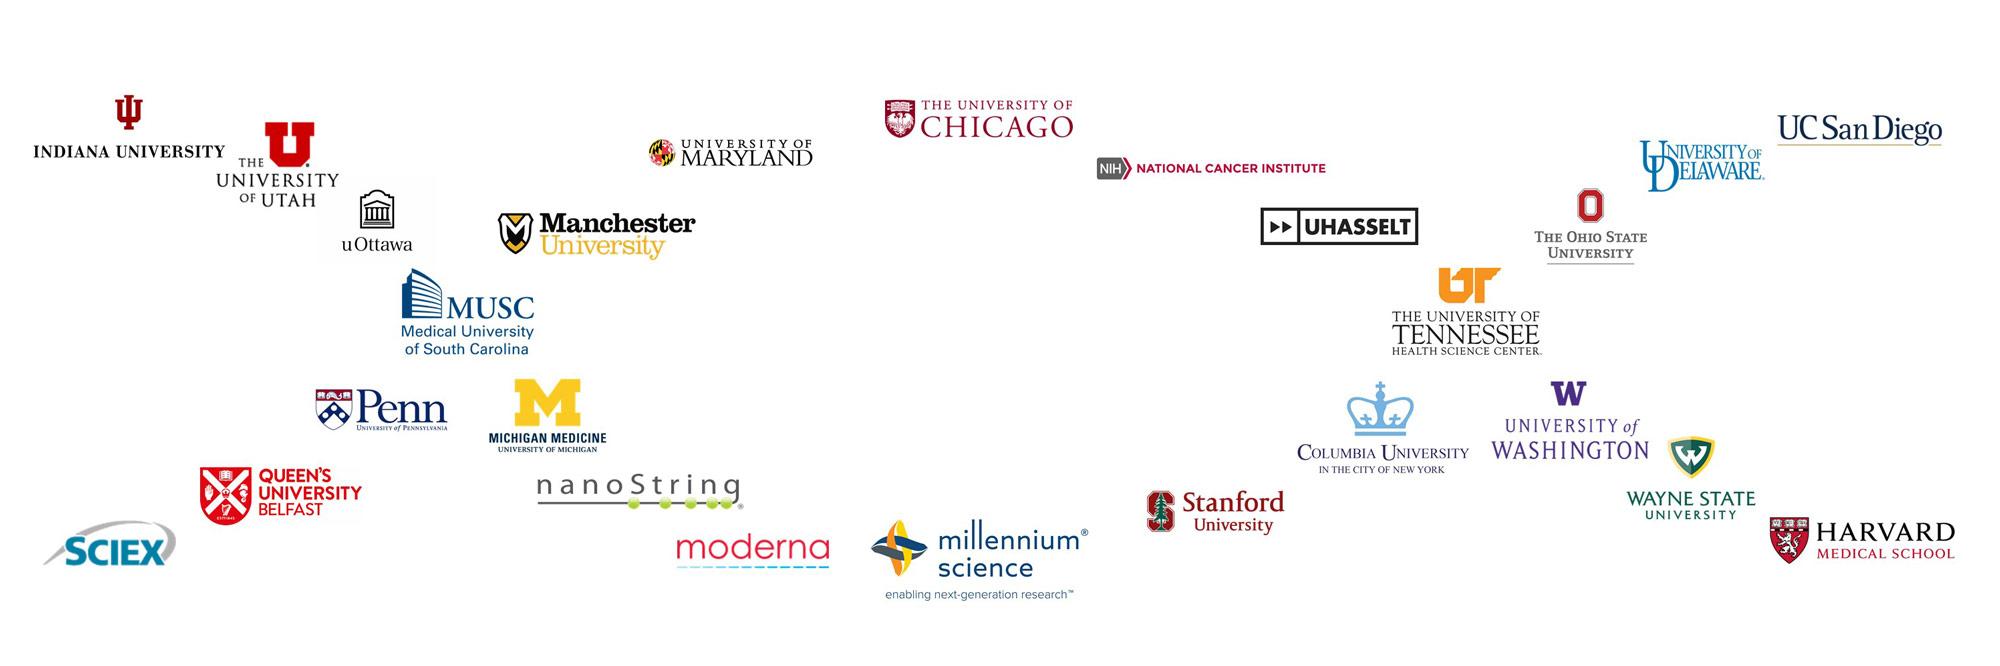 AdvaitaBio Bioinformatics Customers and Partners